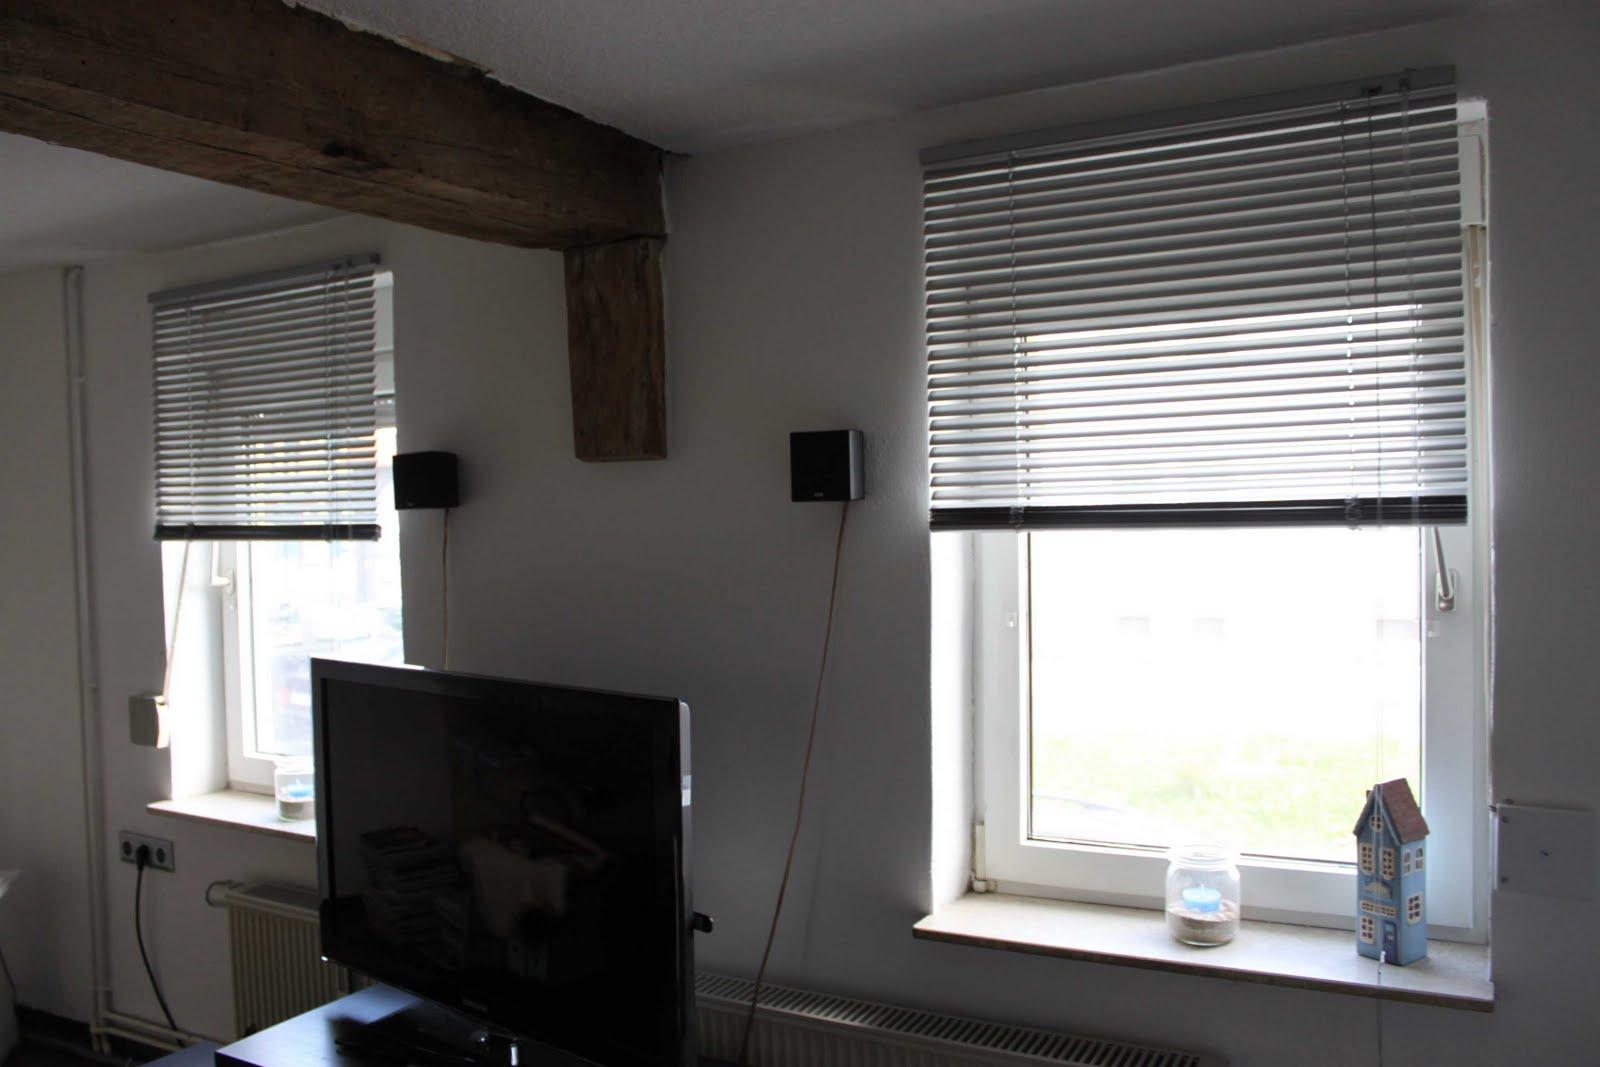 country cottage ikeeeeeeeeeaaaa wohnzimmerrenovierung teil 1. Black Bedroom Furniture Sets. Home Design Ideas